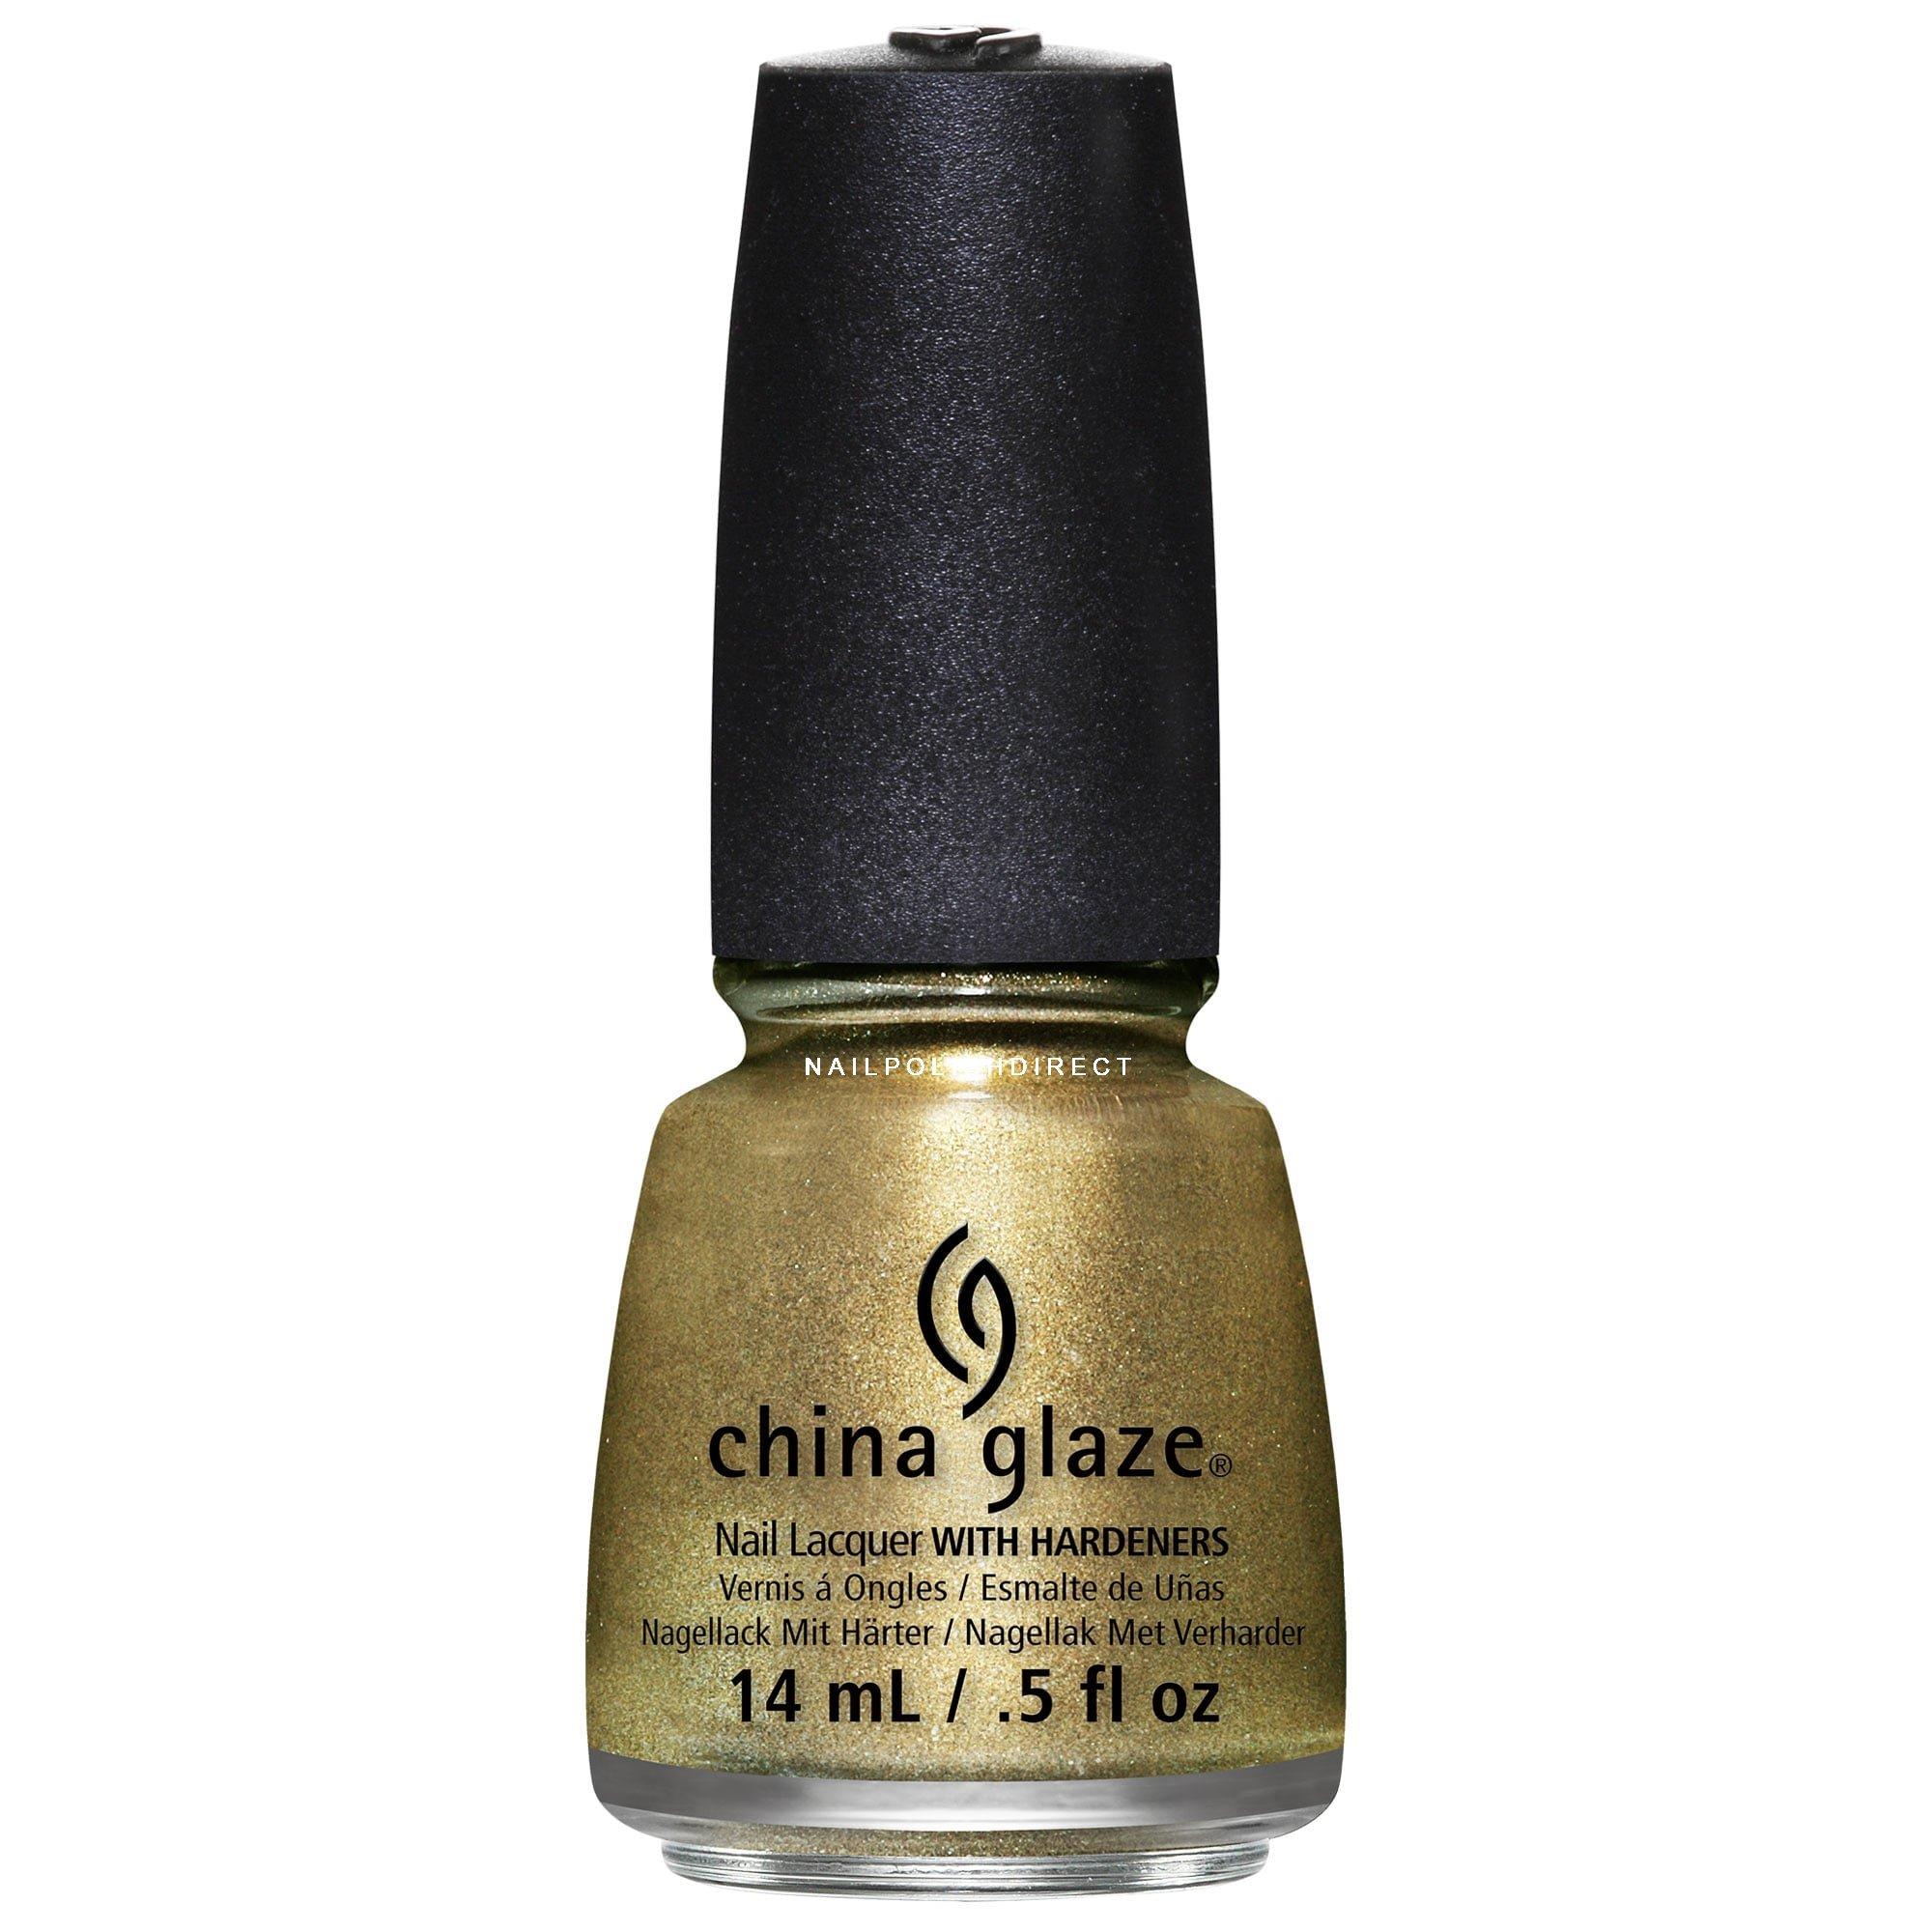 China Glaze All Aboard Nail Polish Collection 2014 - Mind The Gap 14ml